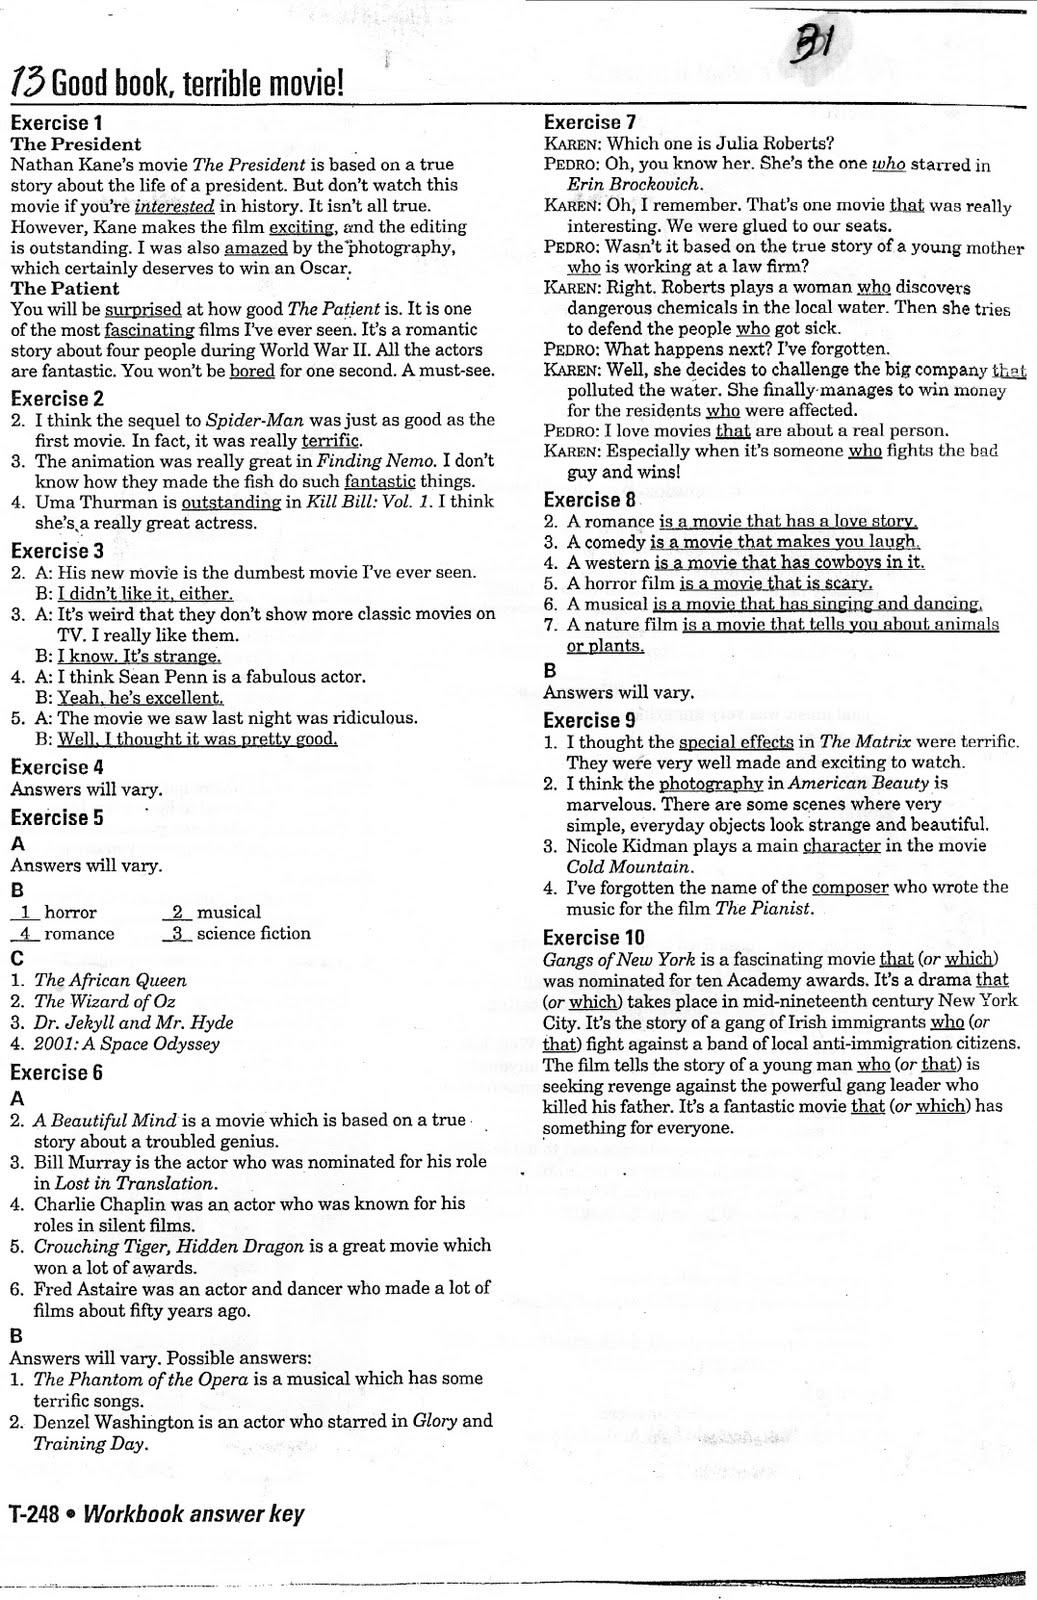 Workbooks answers to spanish 2 workbook : Interchange 2 (English Textbook): septiembre 2010